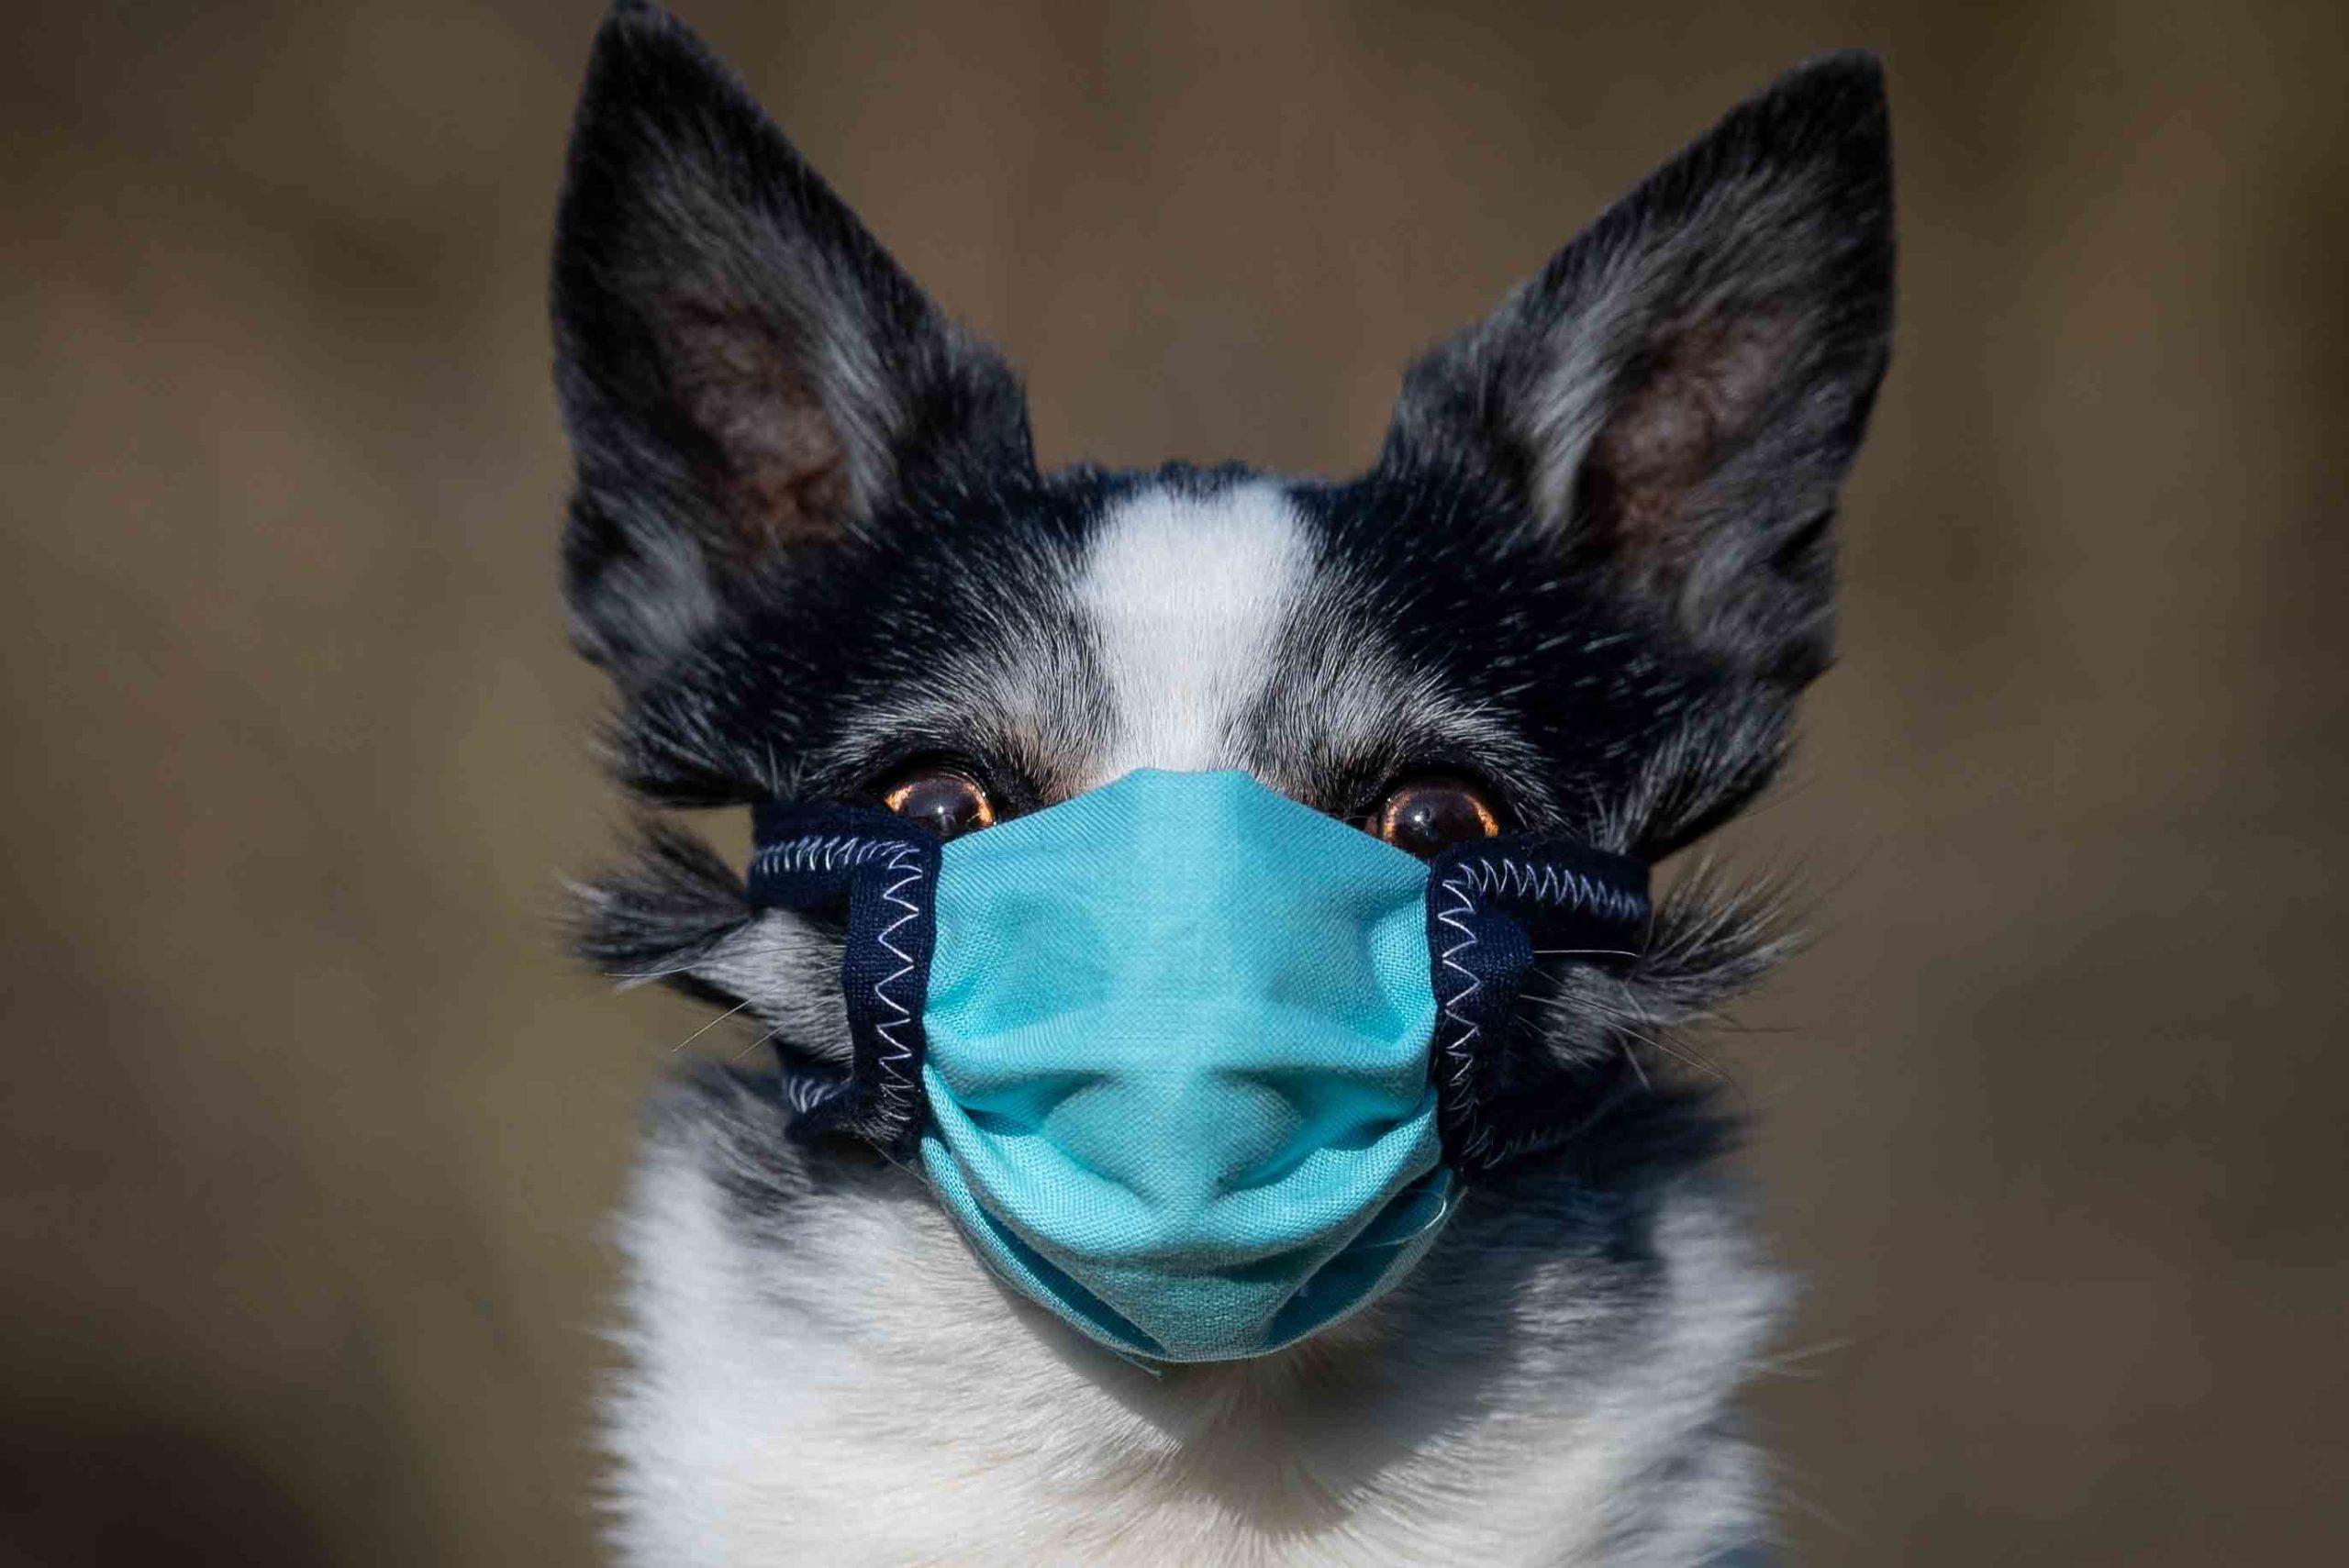 kæledyr og Coronavirus COVID-19